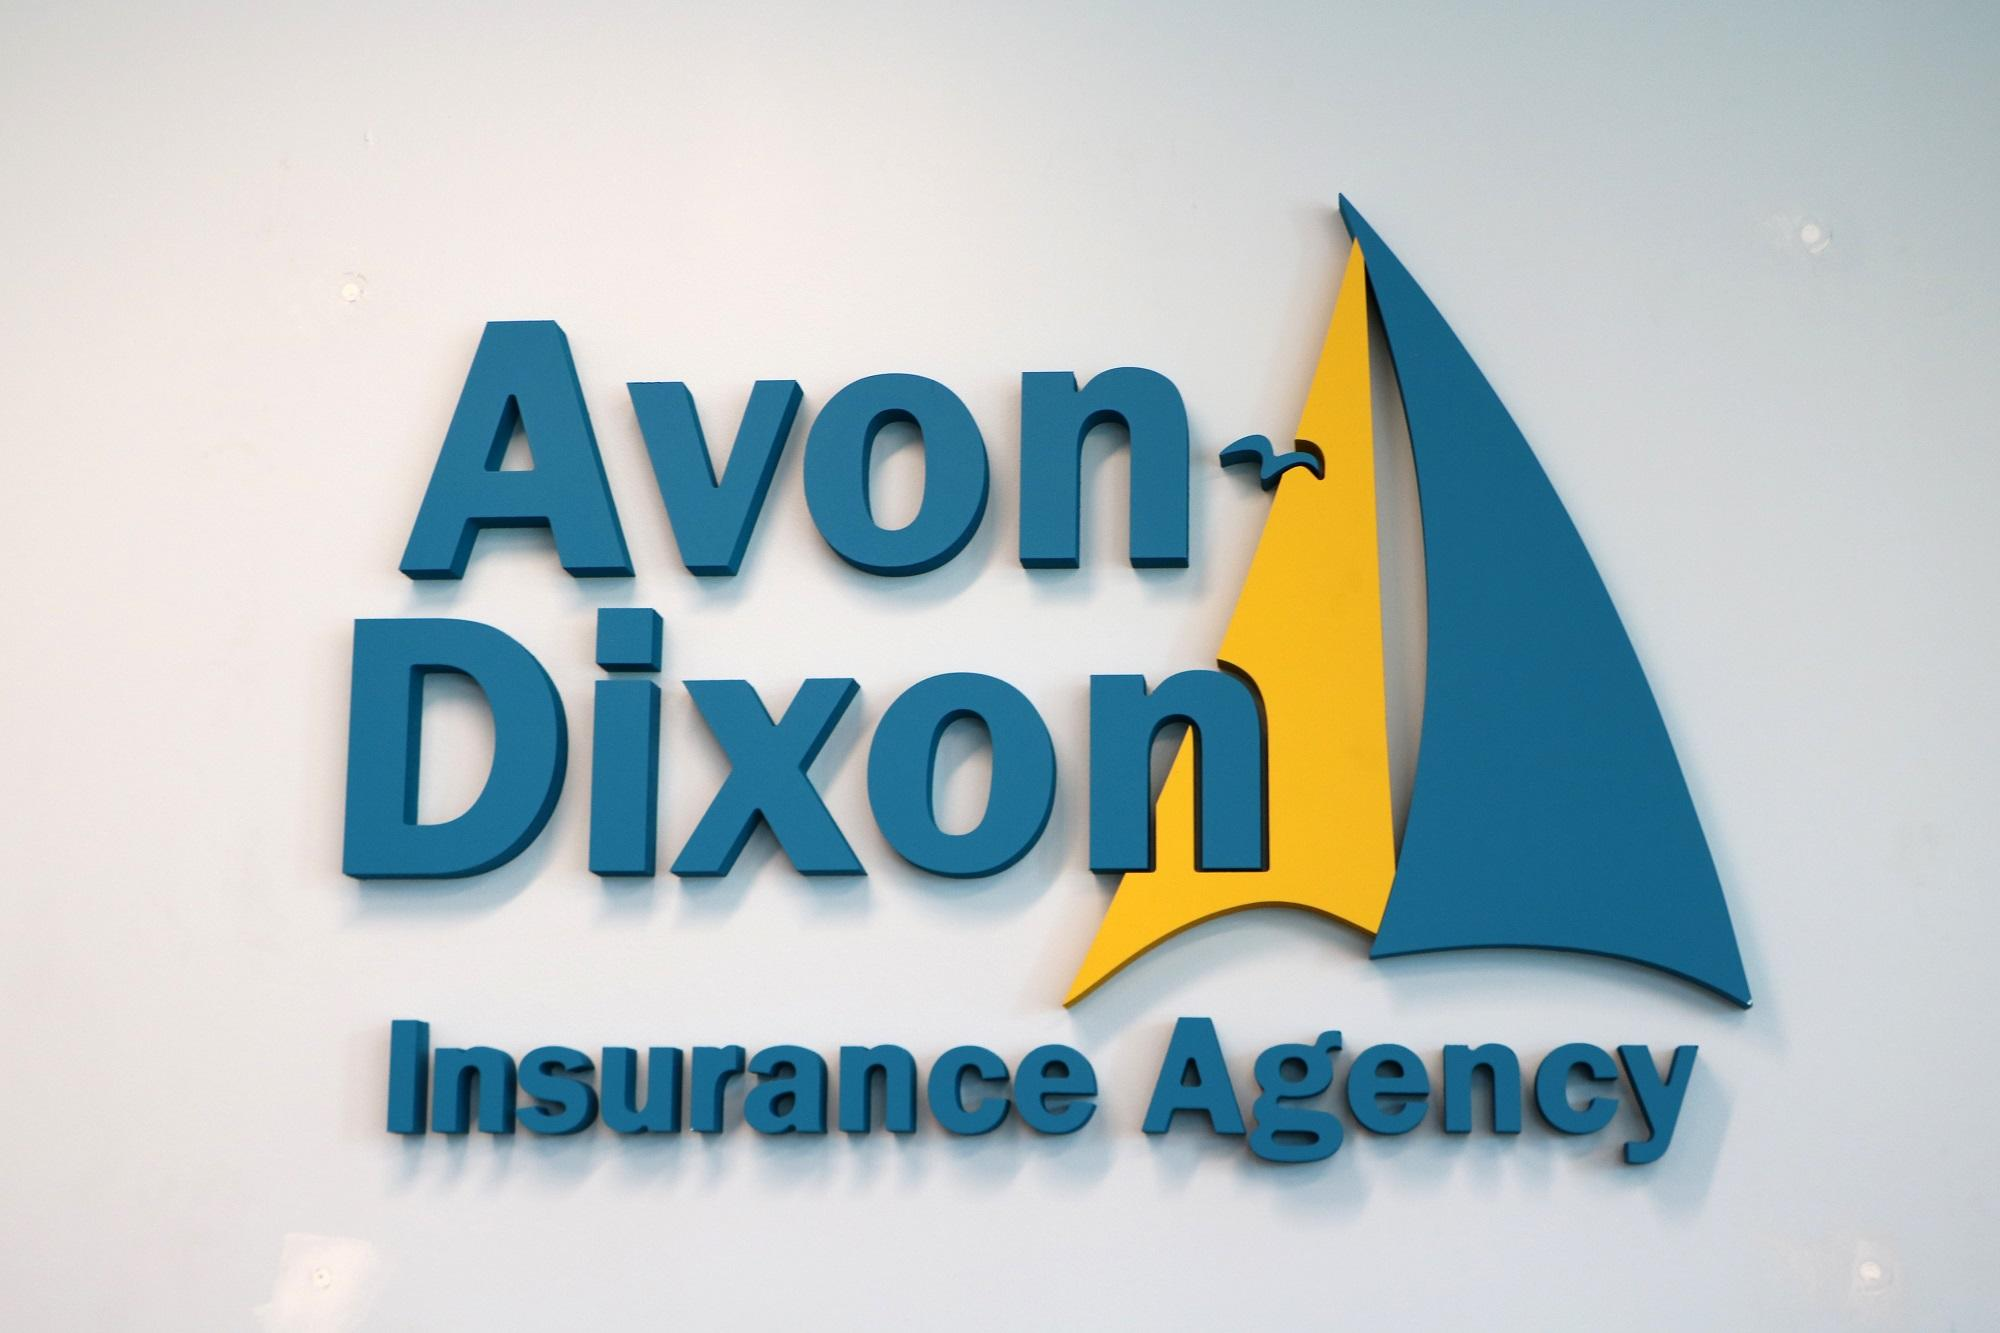 Avon-Dixon Insurance Agency image 1